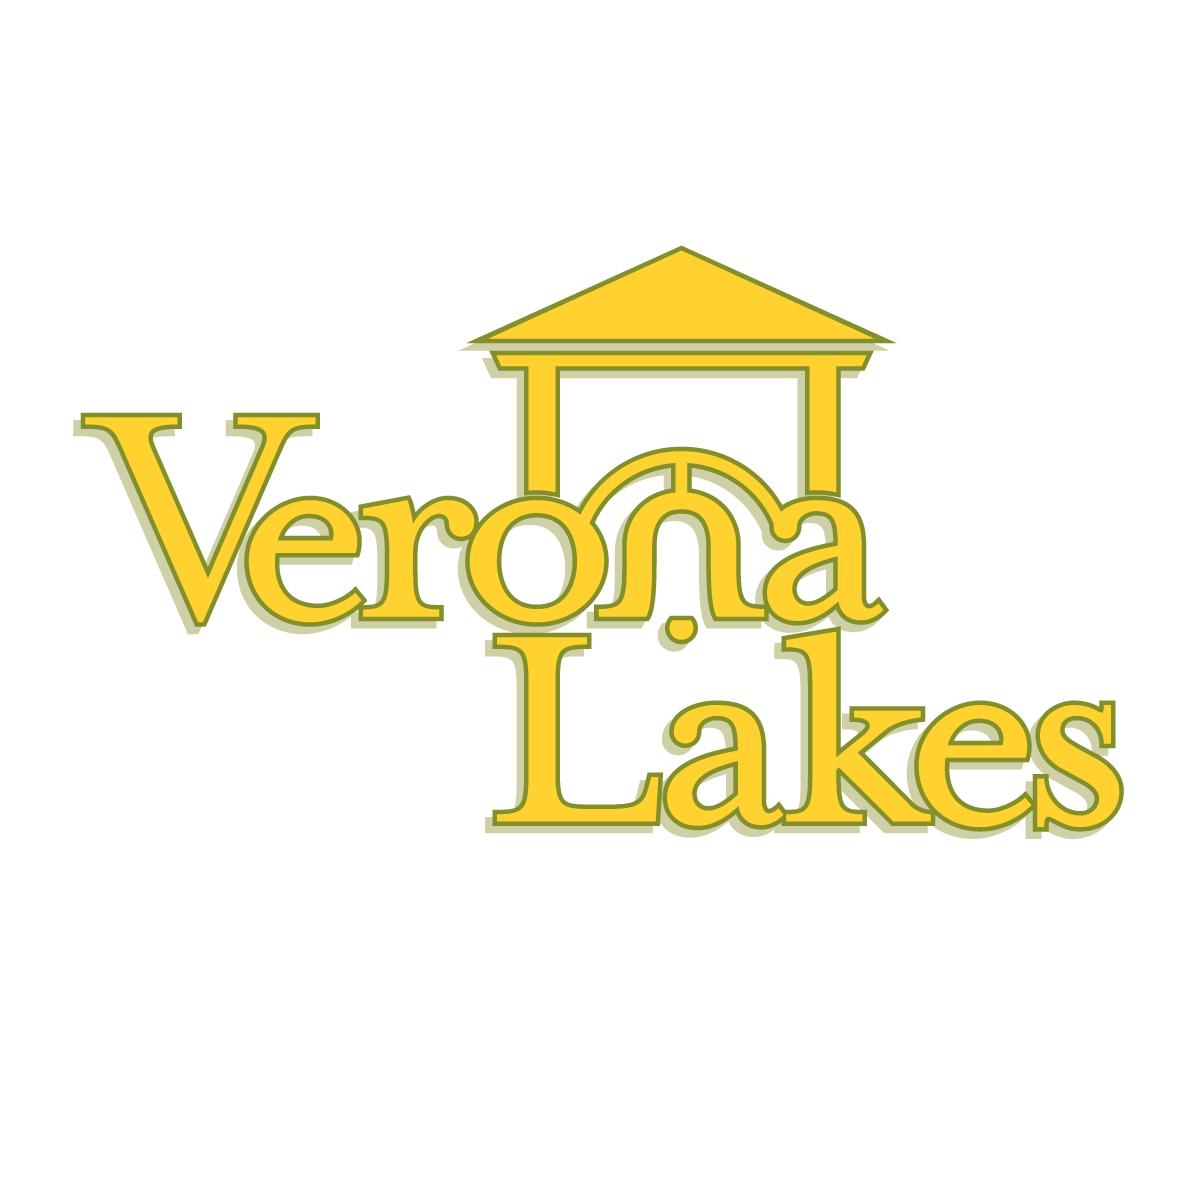 Verona_Lakes_logo_01.jpg